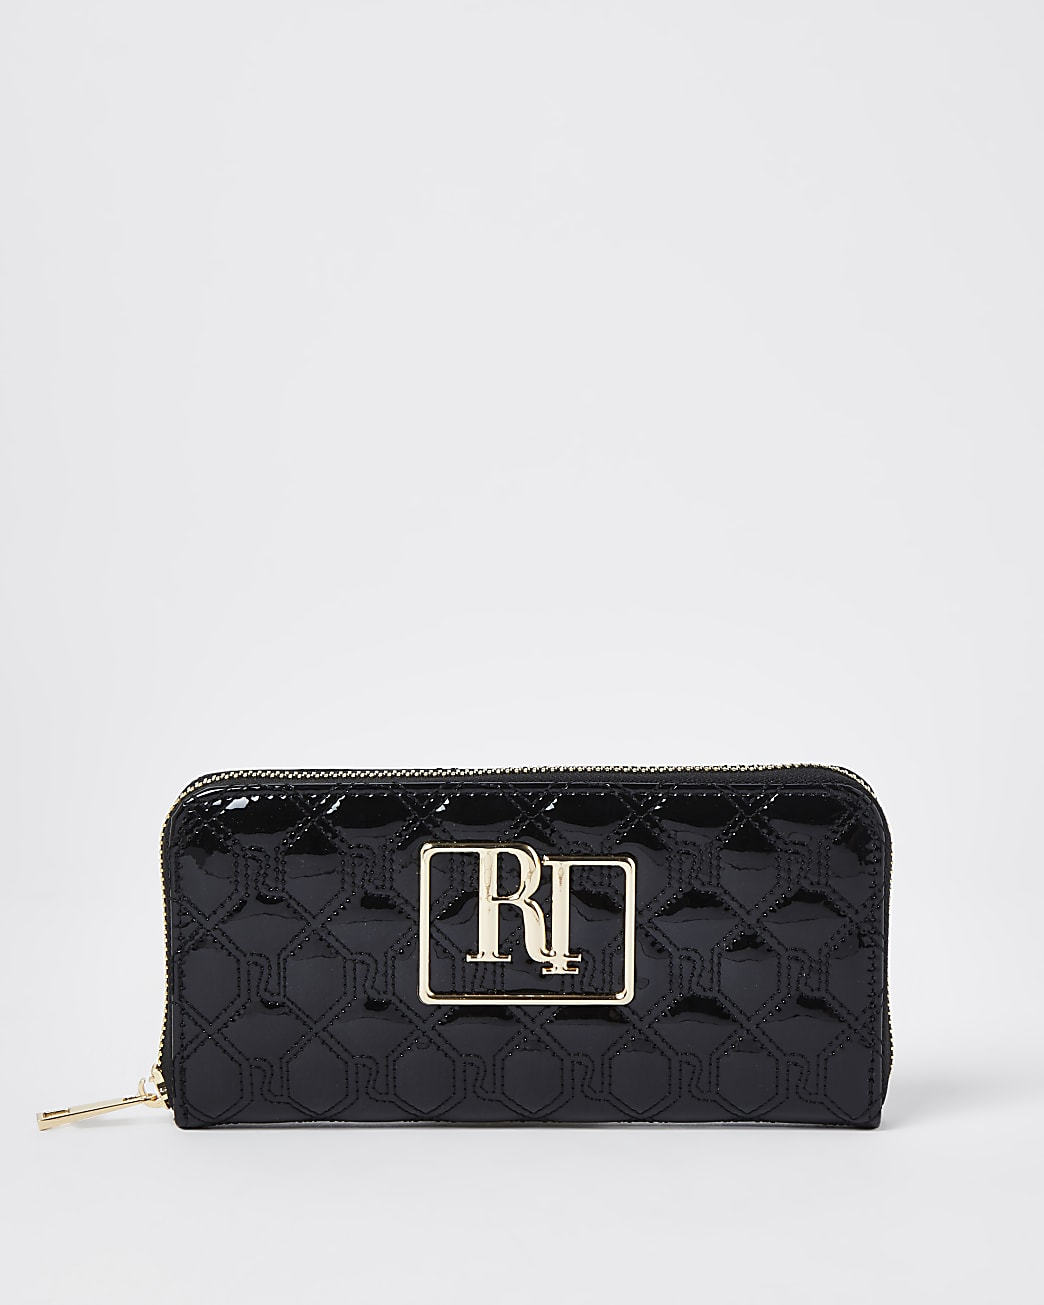 Black RI stitch embossed purse